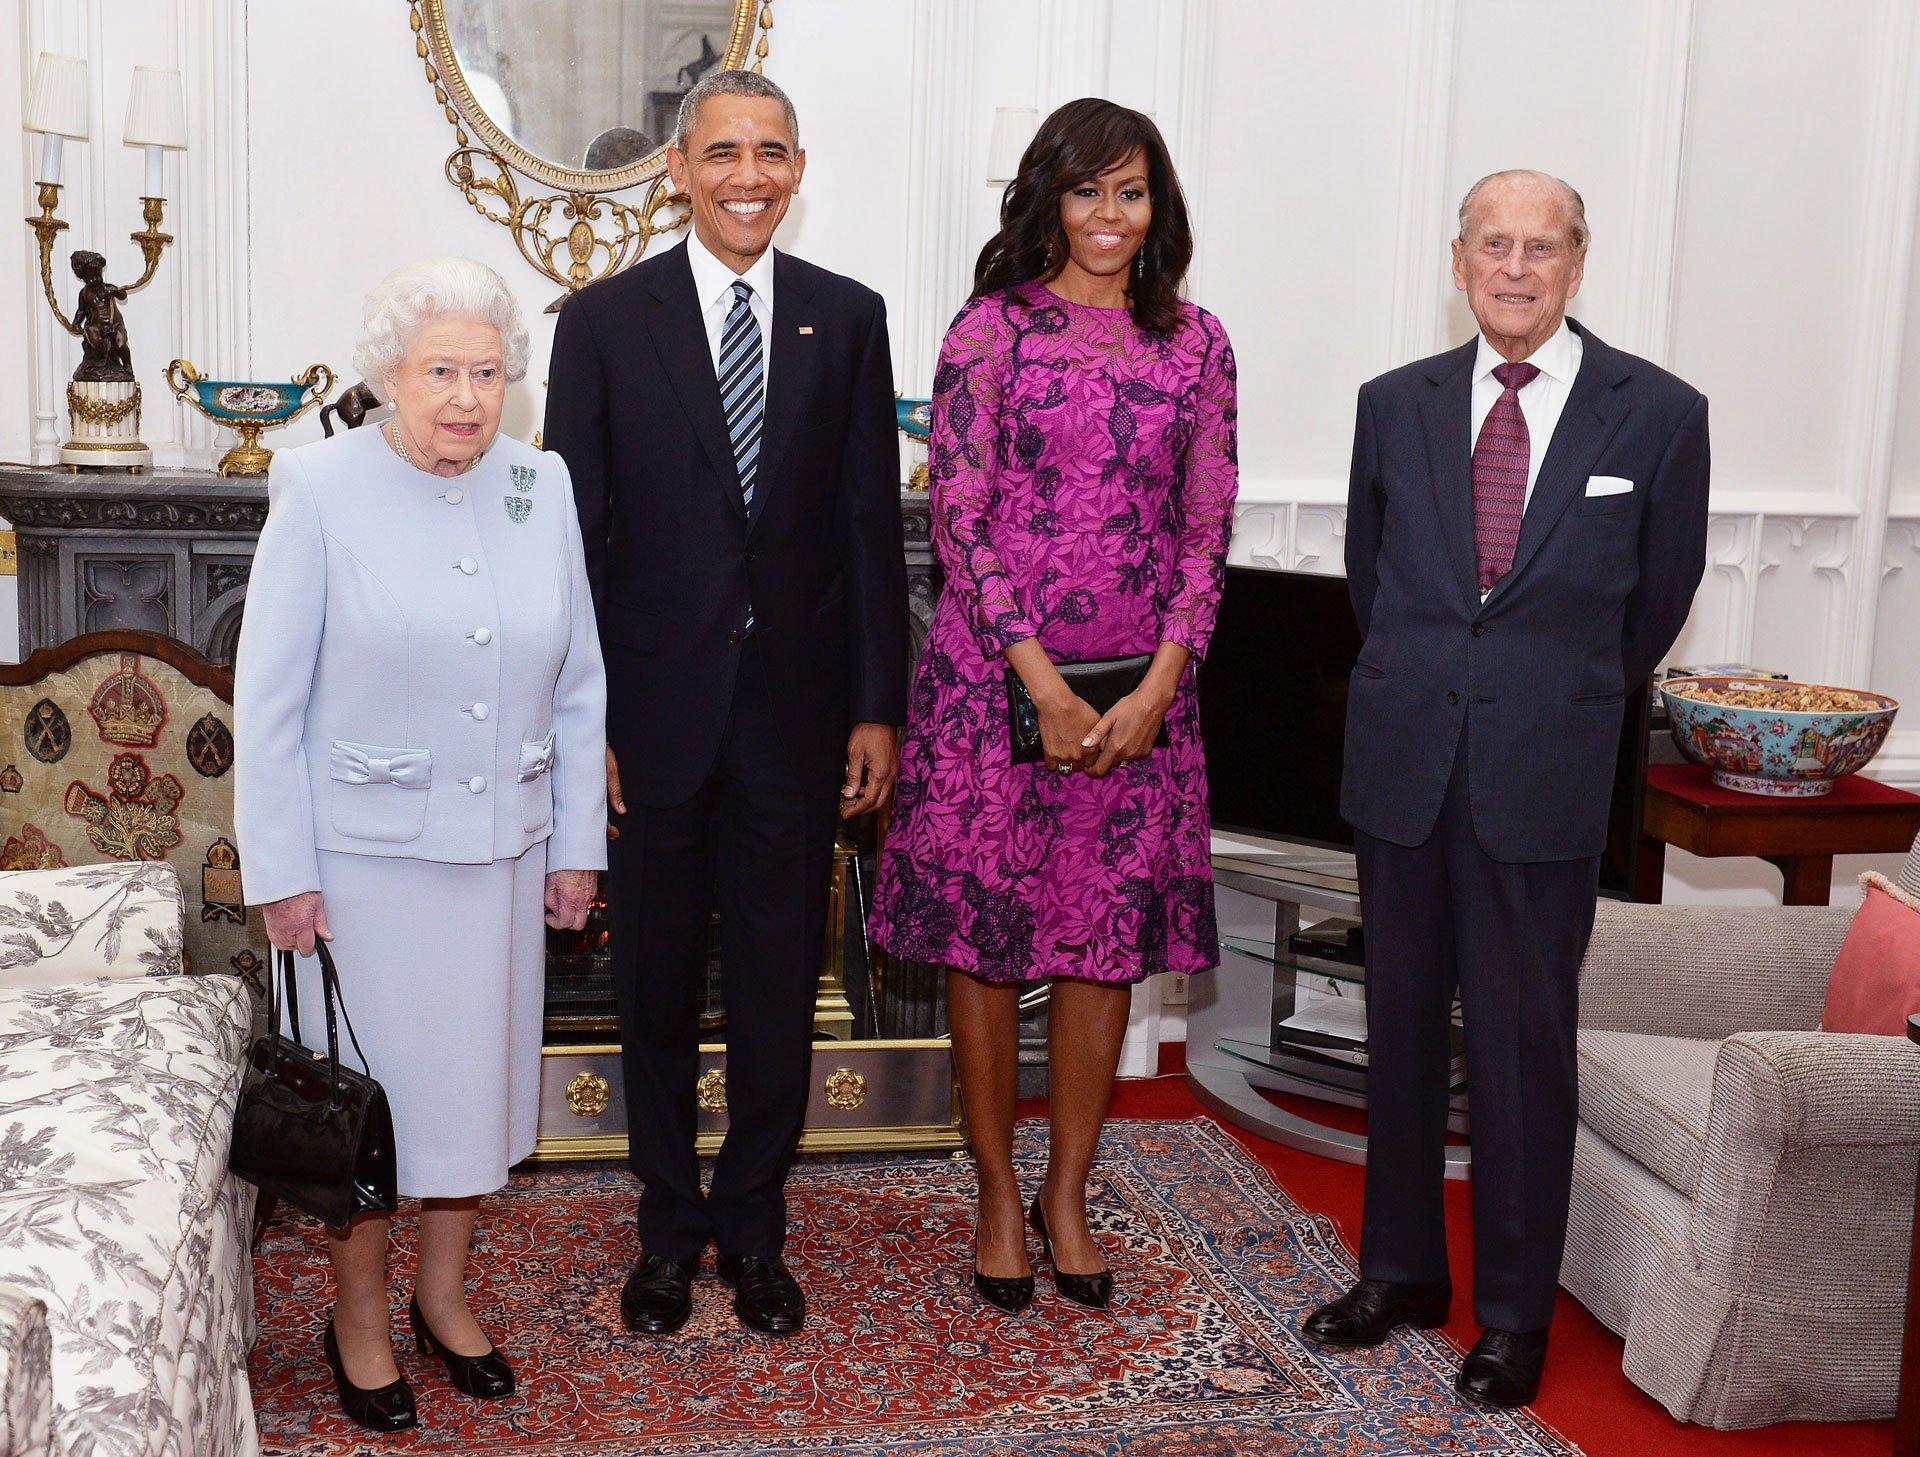 La foto oficial: Isabel II, Barack Obama, Michelle Obama y Felipe, duque de Edimburgo